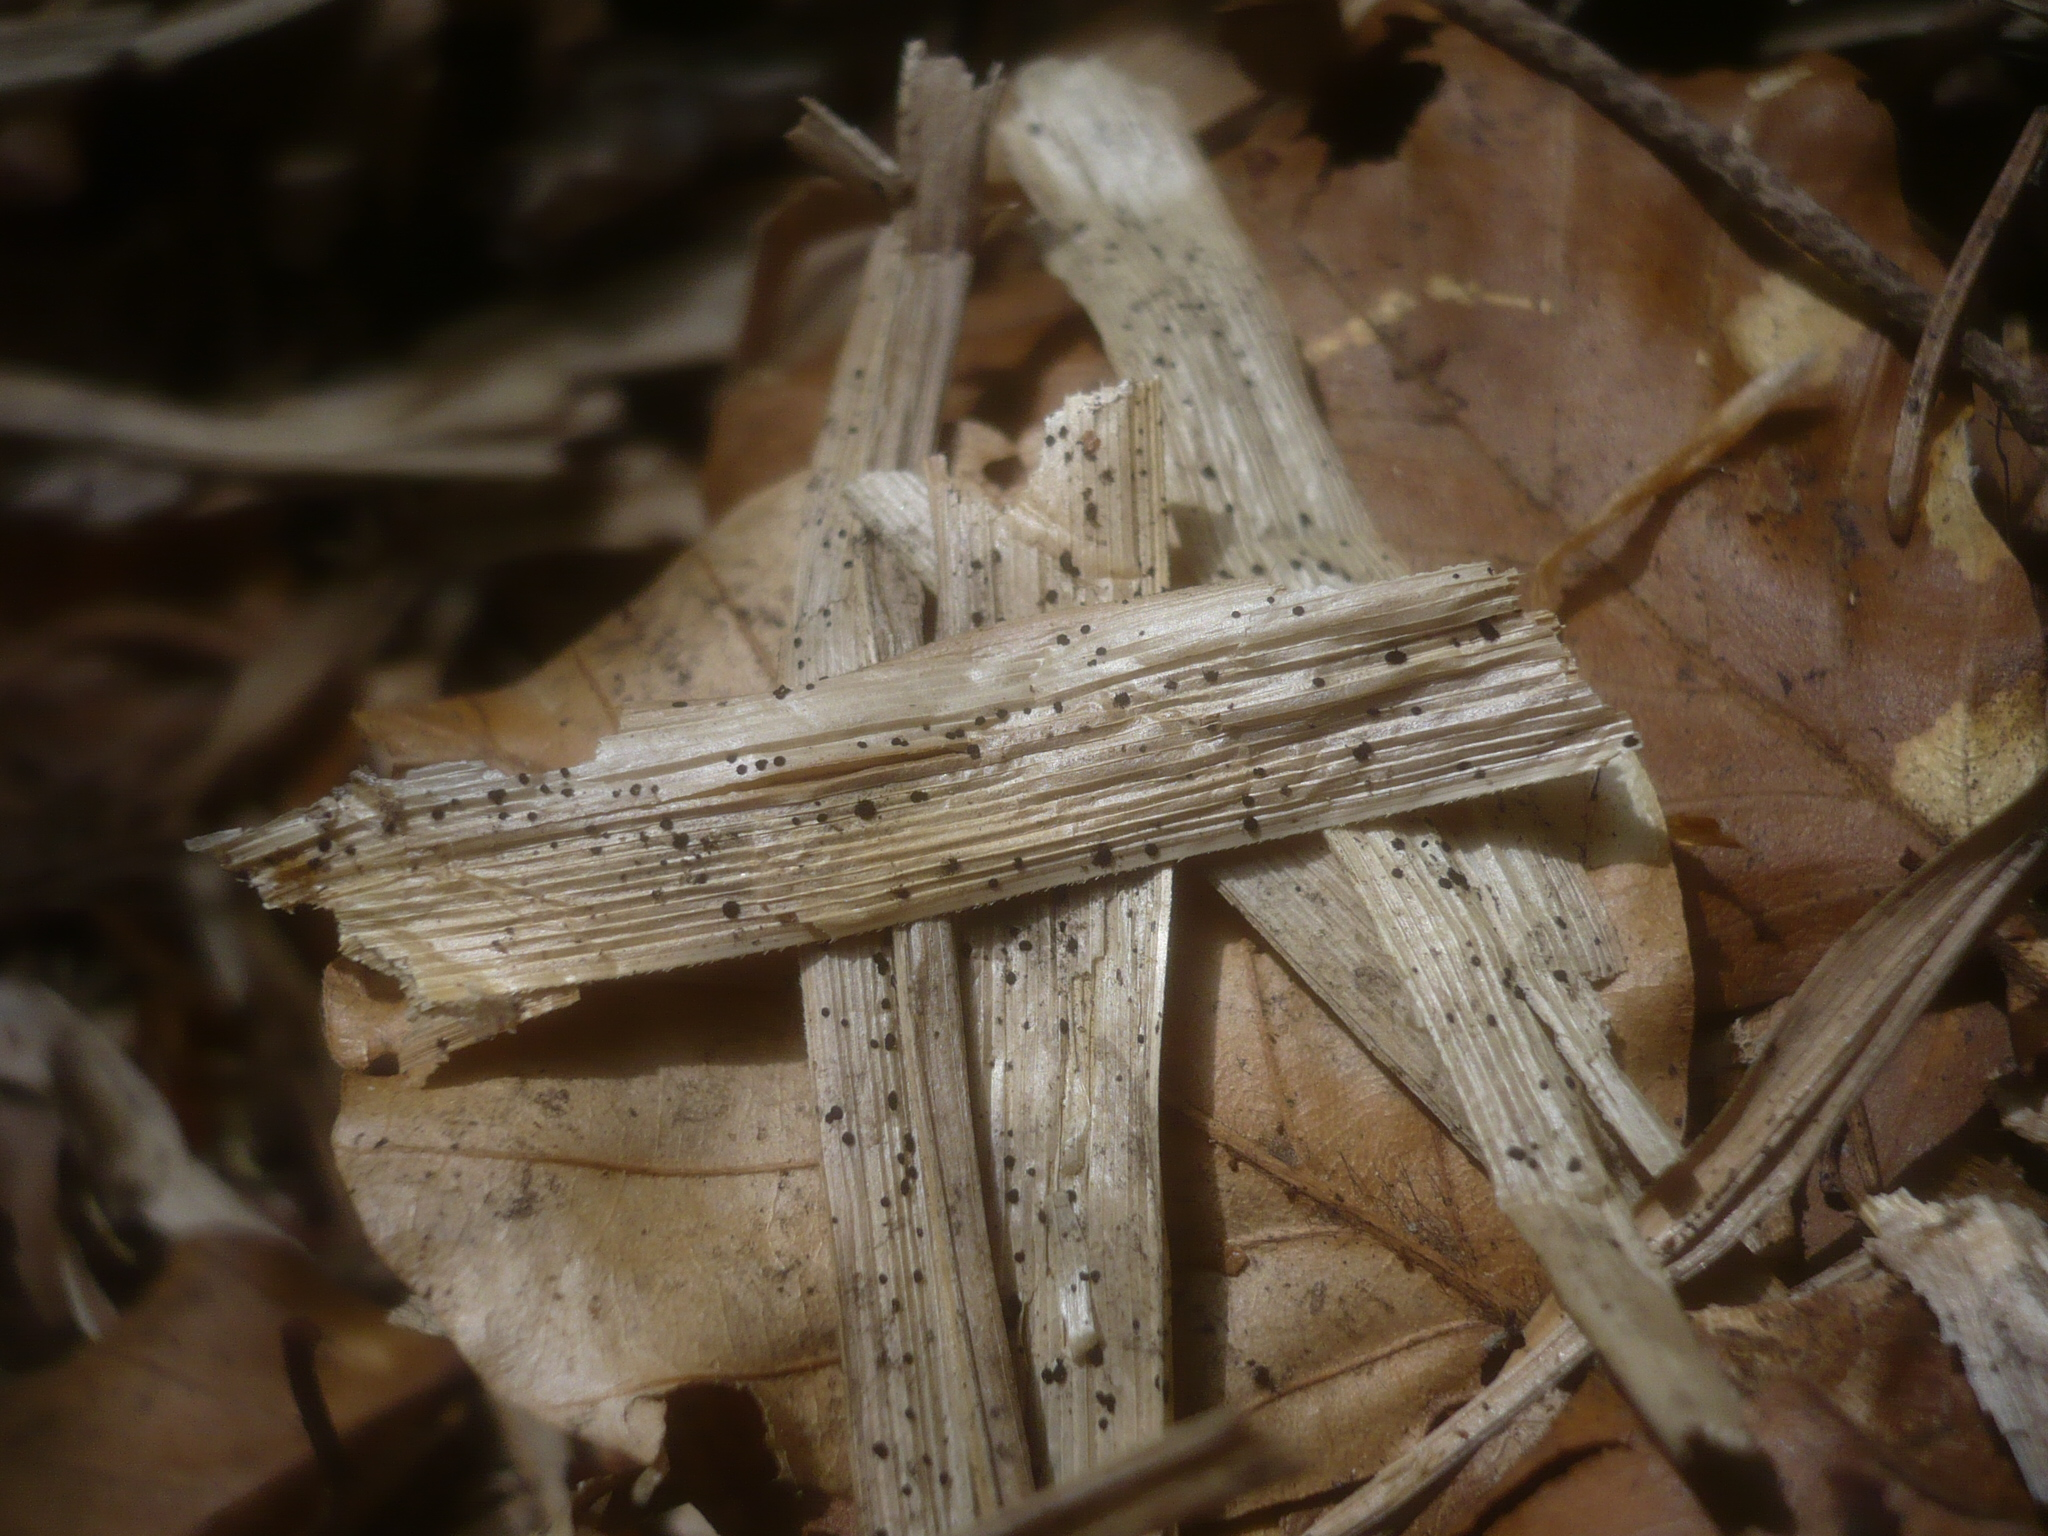 Anthostomella caricis image